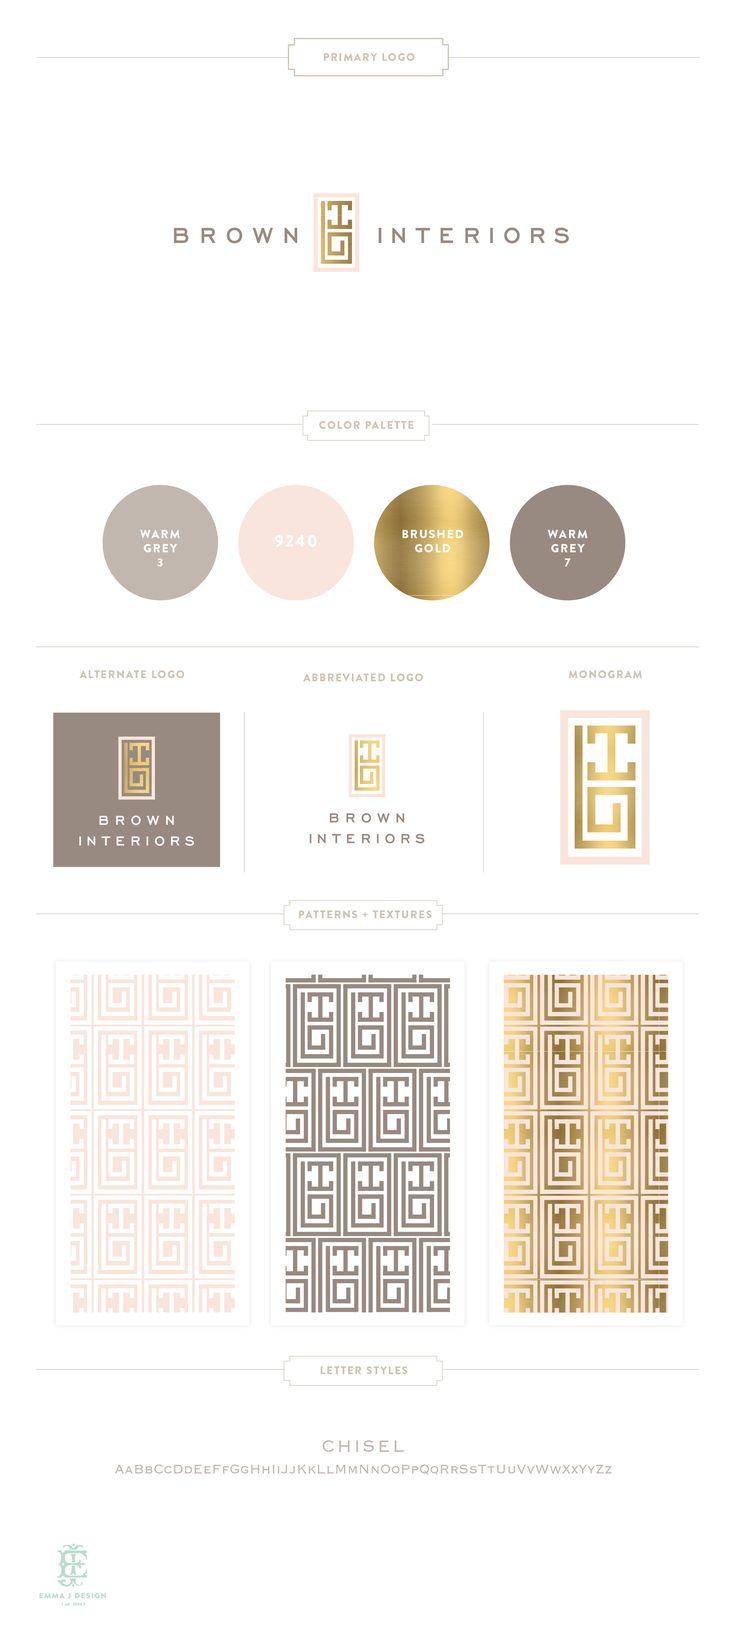 Branding Design for Brown Interiors  |  www.EmilyMcCarthy.com | Luxury Branding, Logo, Monogram, Interior Designer Branding